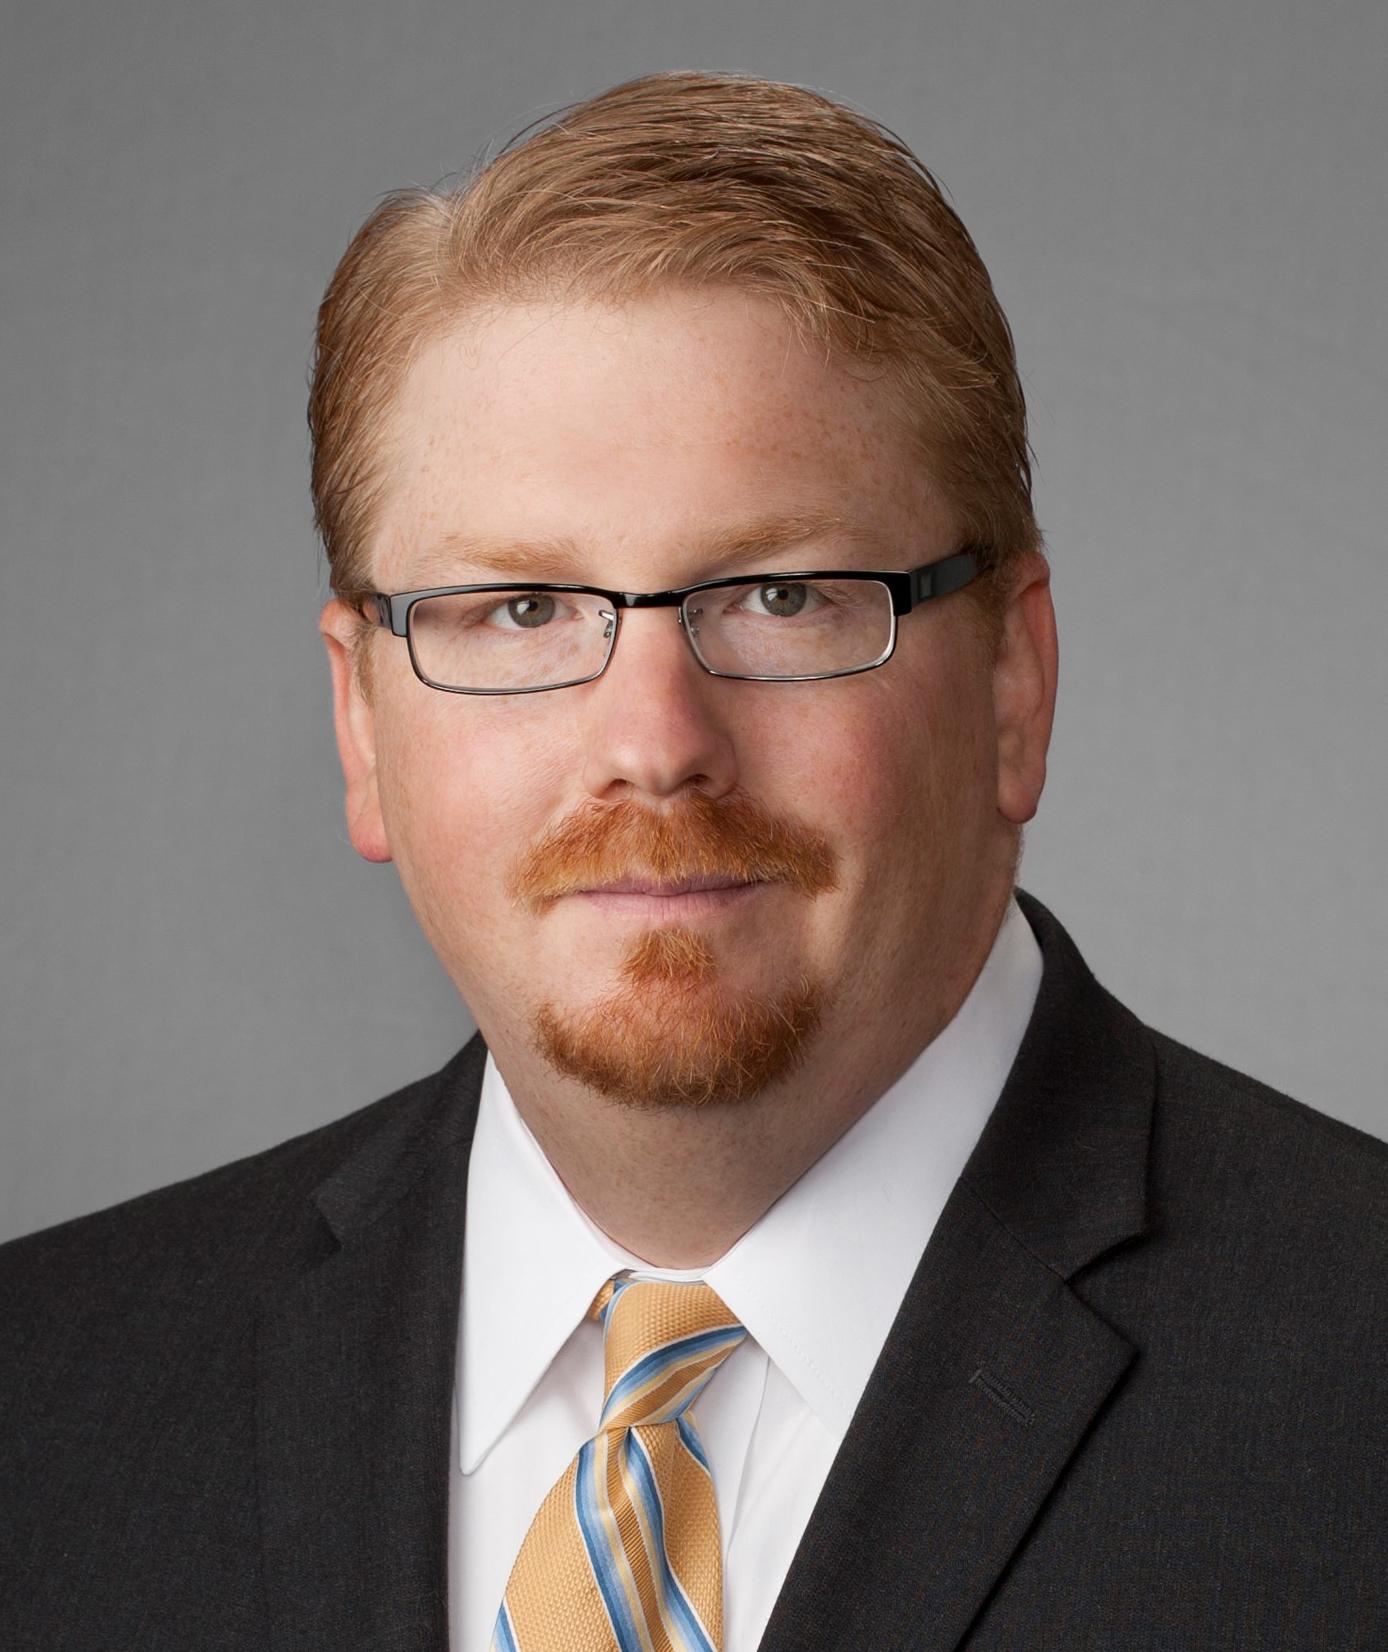 Photo of David L. Curry, Jr.